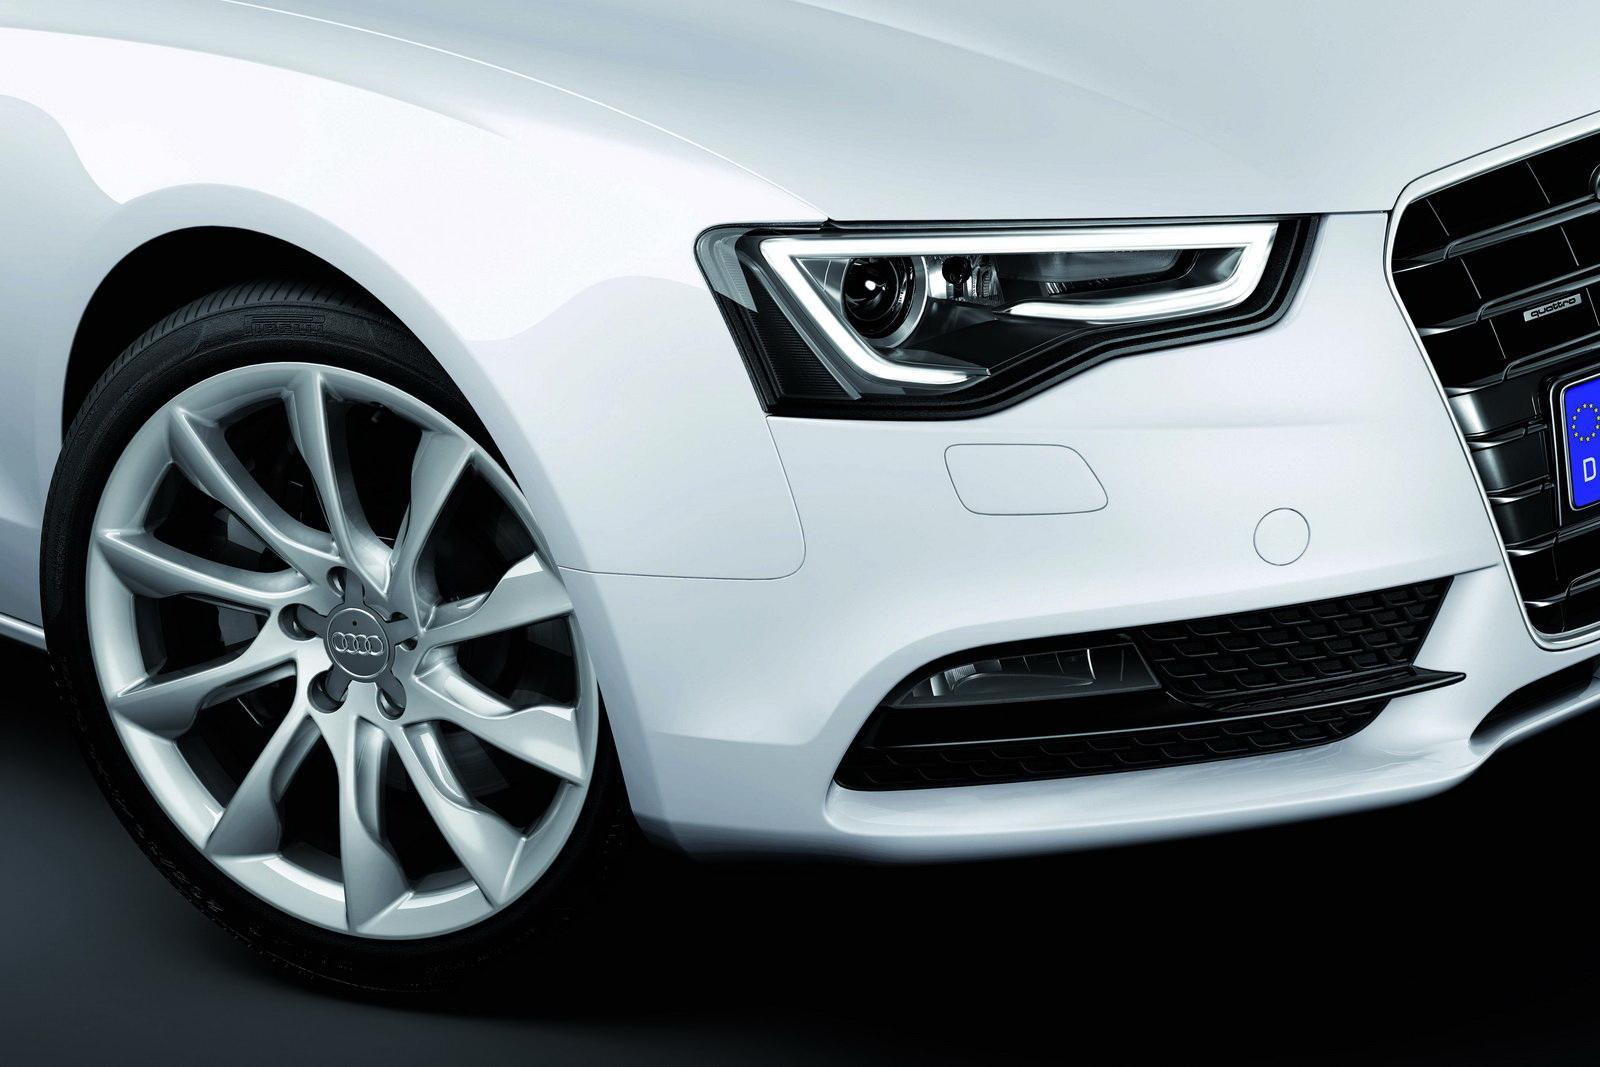 2012 Audi A5 Model Range And S5 Facelift Revealed Benautobahn